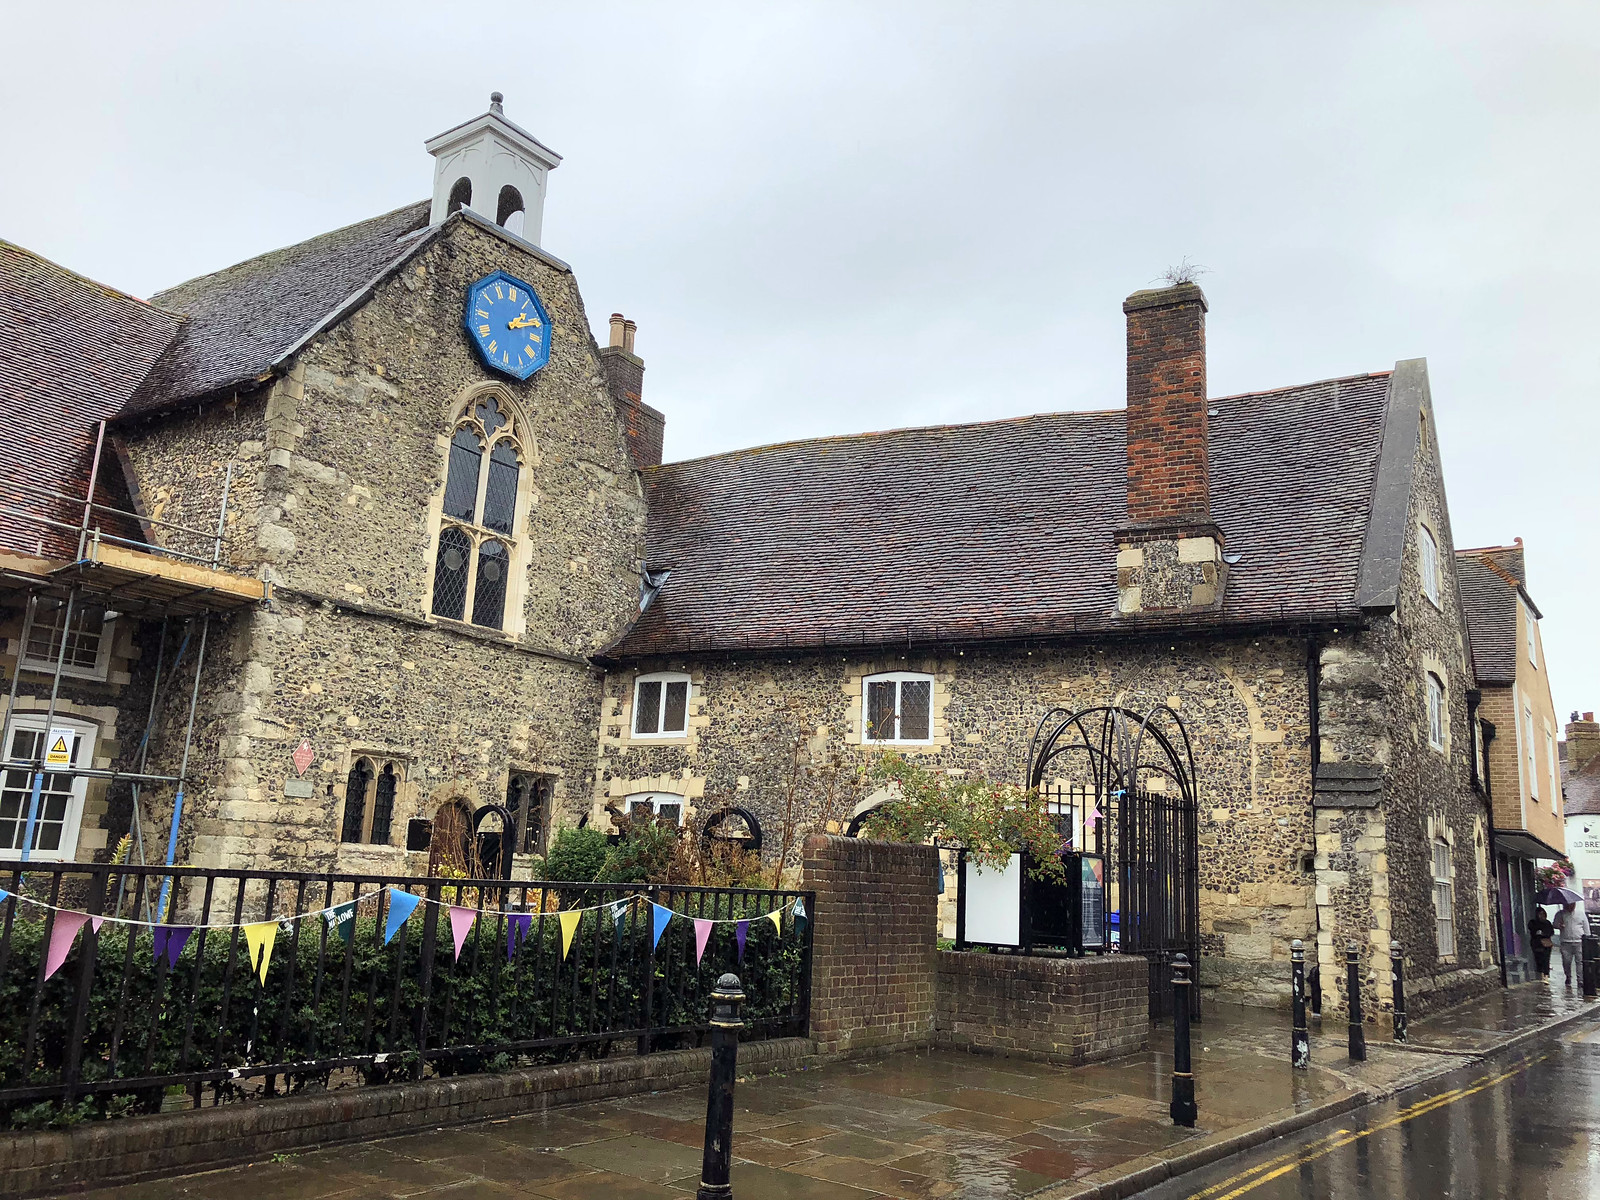 Sandwich, Kent, Inglaterra, UK, pueblo - thewotme sandwich - 50001932537 dd053d3c78 h - Sandwich, un lugar en boca de todos